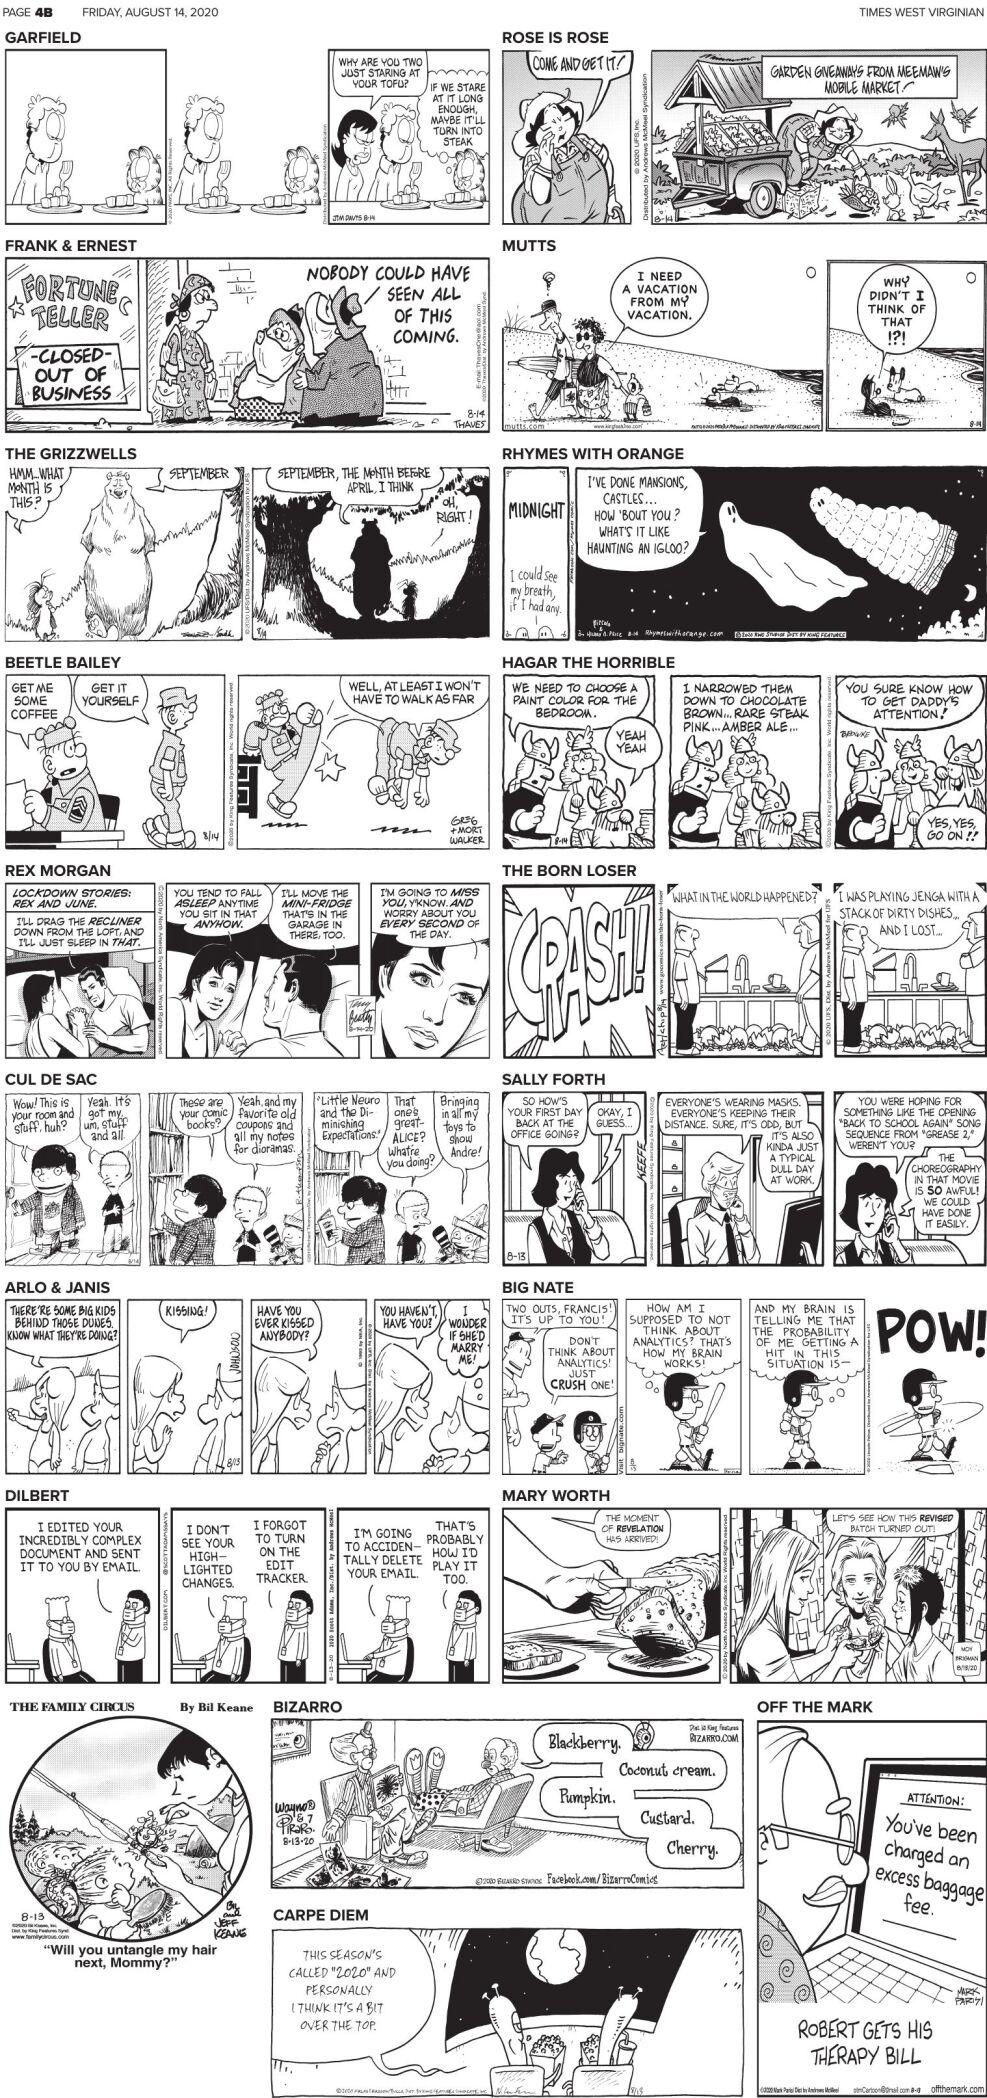 Aug. 14 comics.pdf